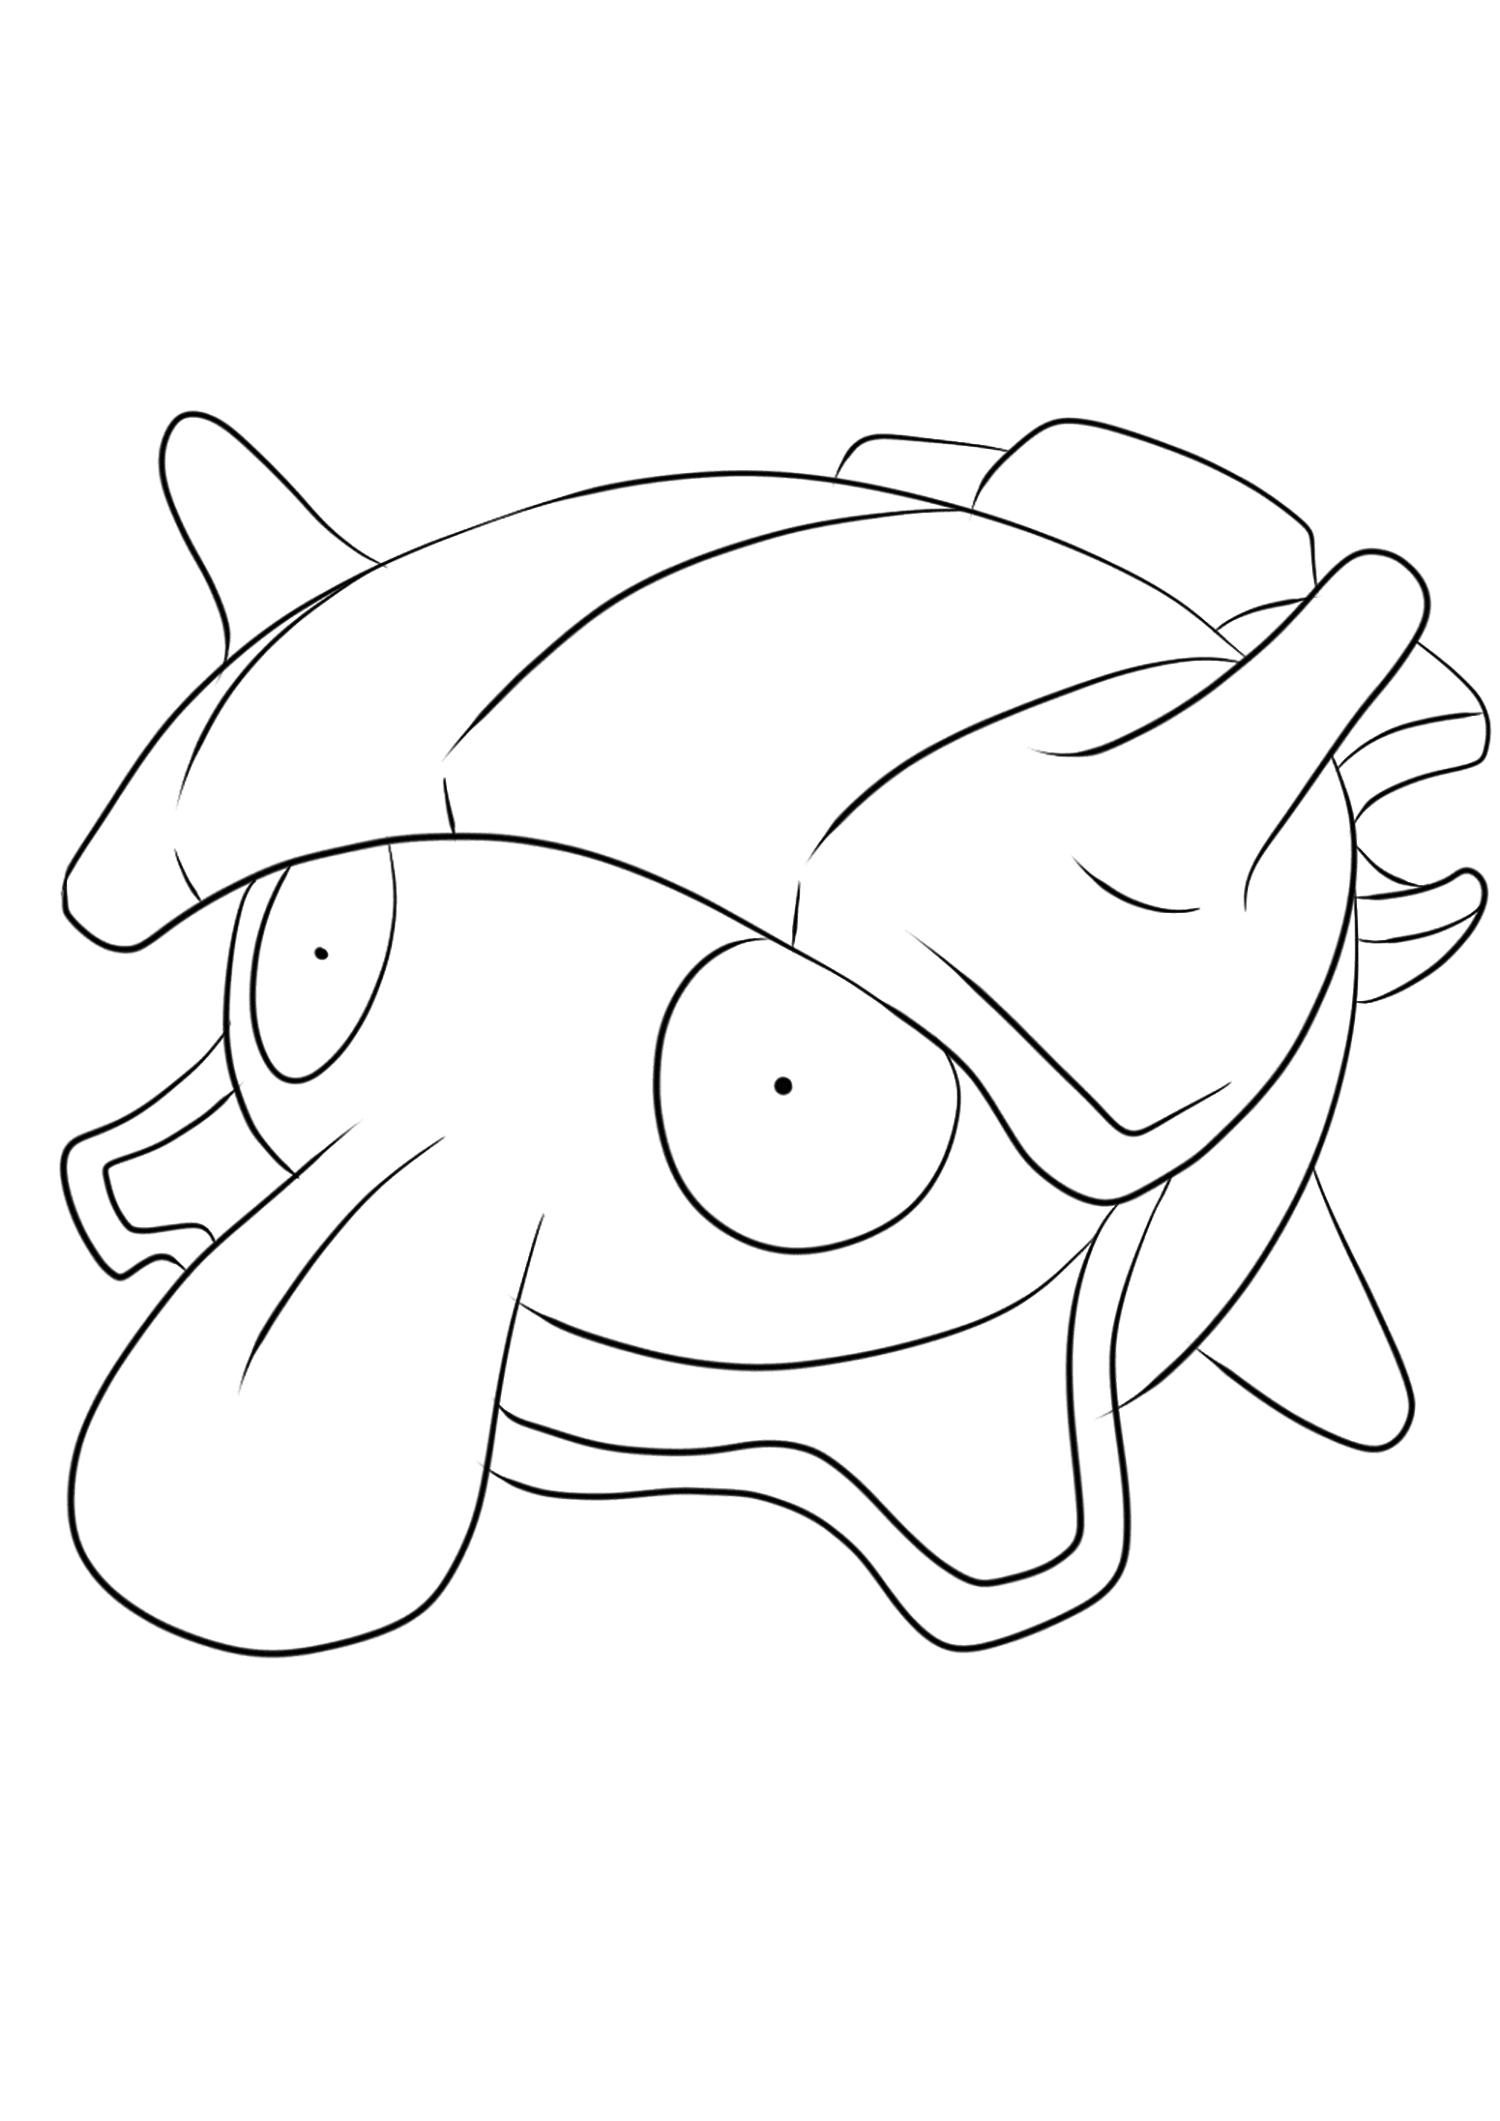 Kokiyas (No.90)Coloriage de Kokiyas (Shellder), Pokémon de Génération I, de type : EauOriginal image credit: Pokemon linearts by Lilly Gerbil on Deviantart.Permission:  All rights reserved © Pokemon company and Ken Sugimori.